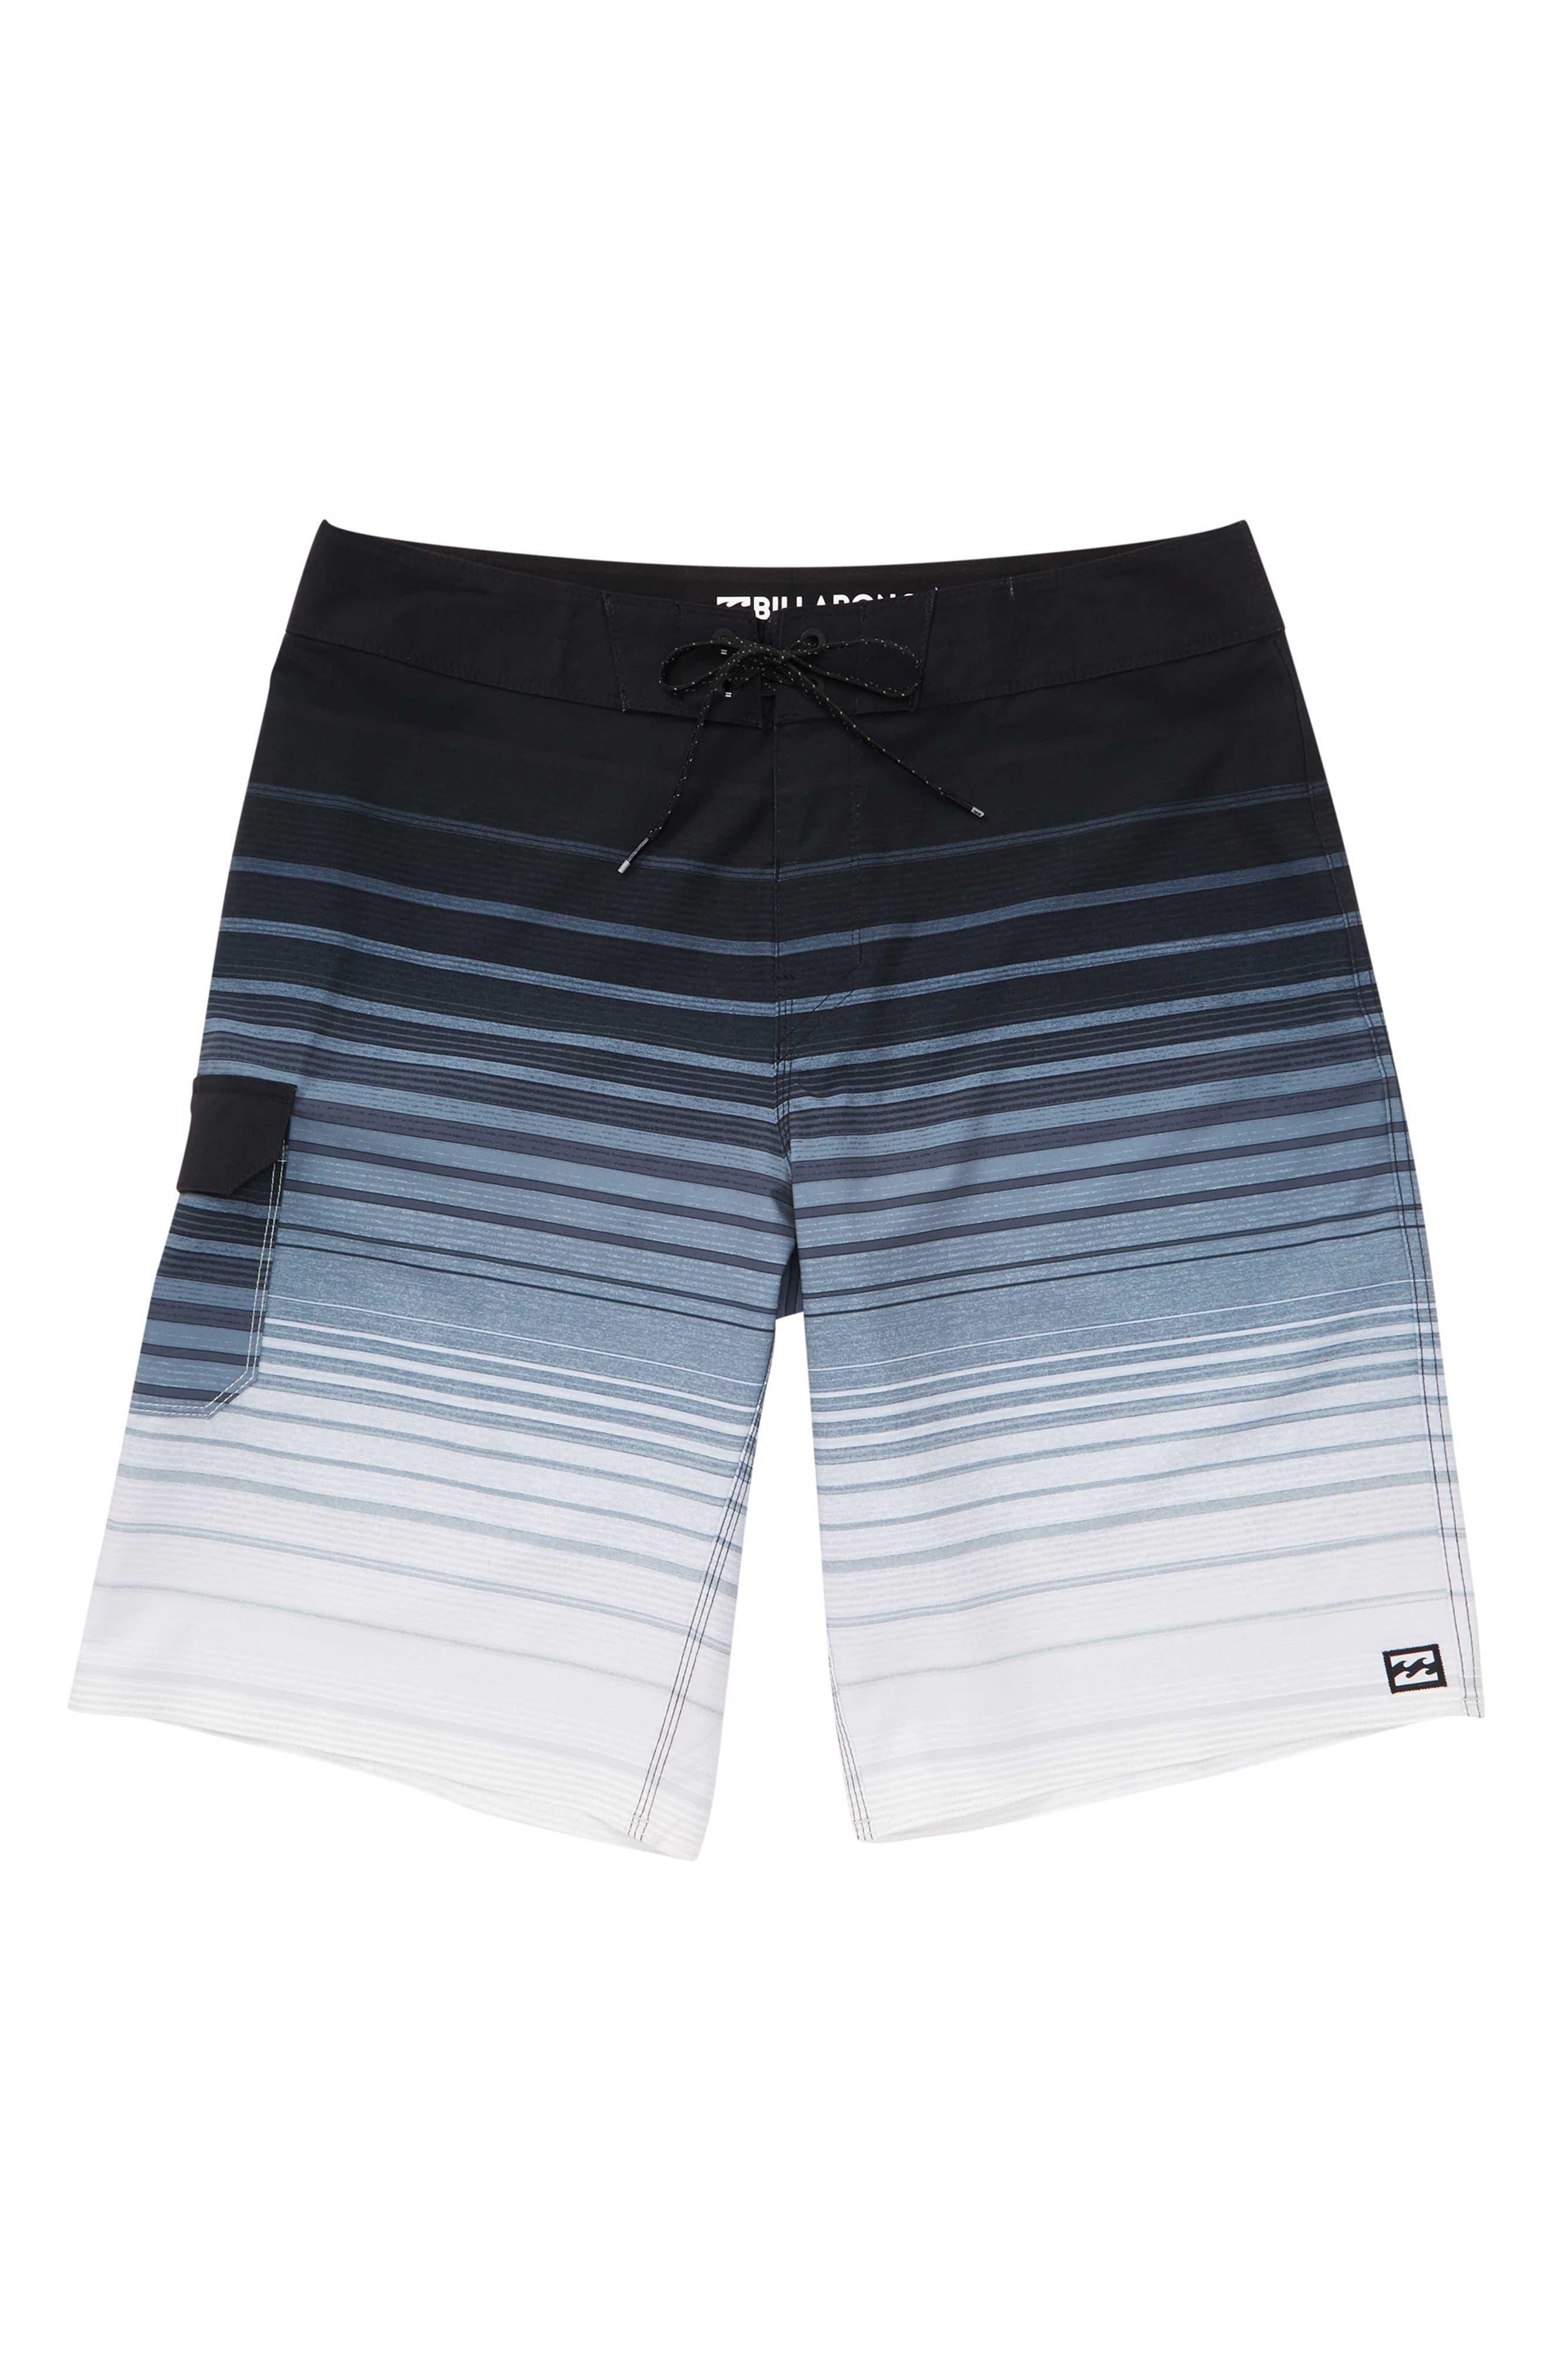 All Day Pro Board Shorts,                             Main thumbnail 1, color,                             BLACK